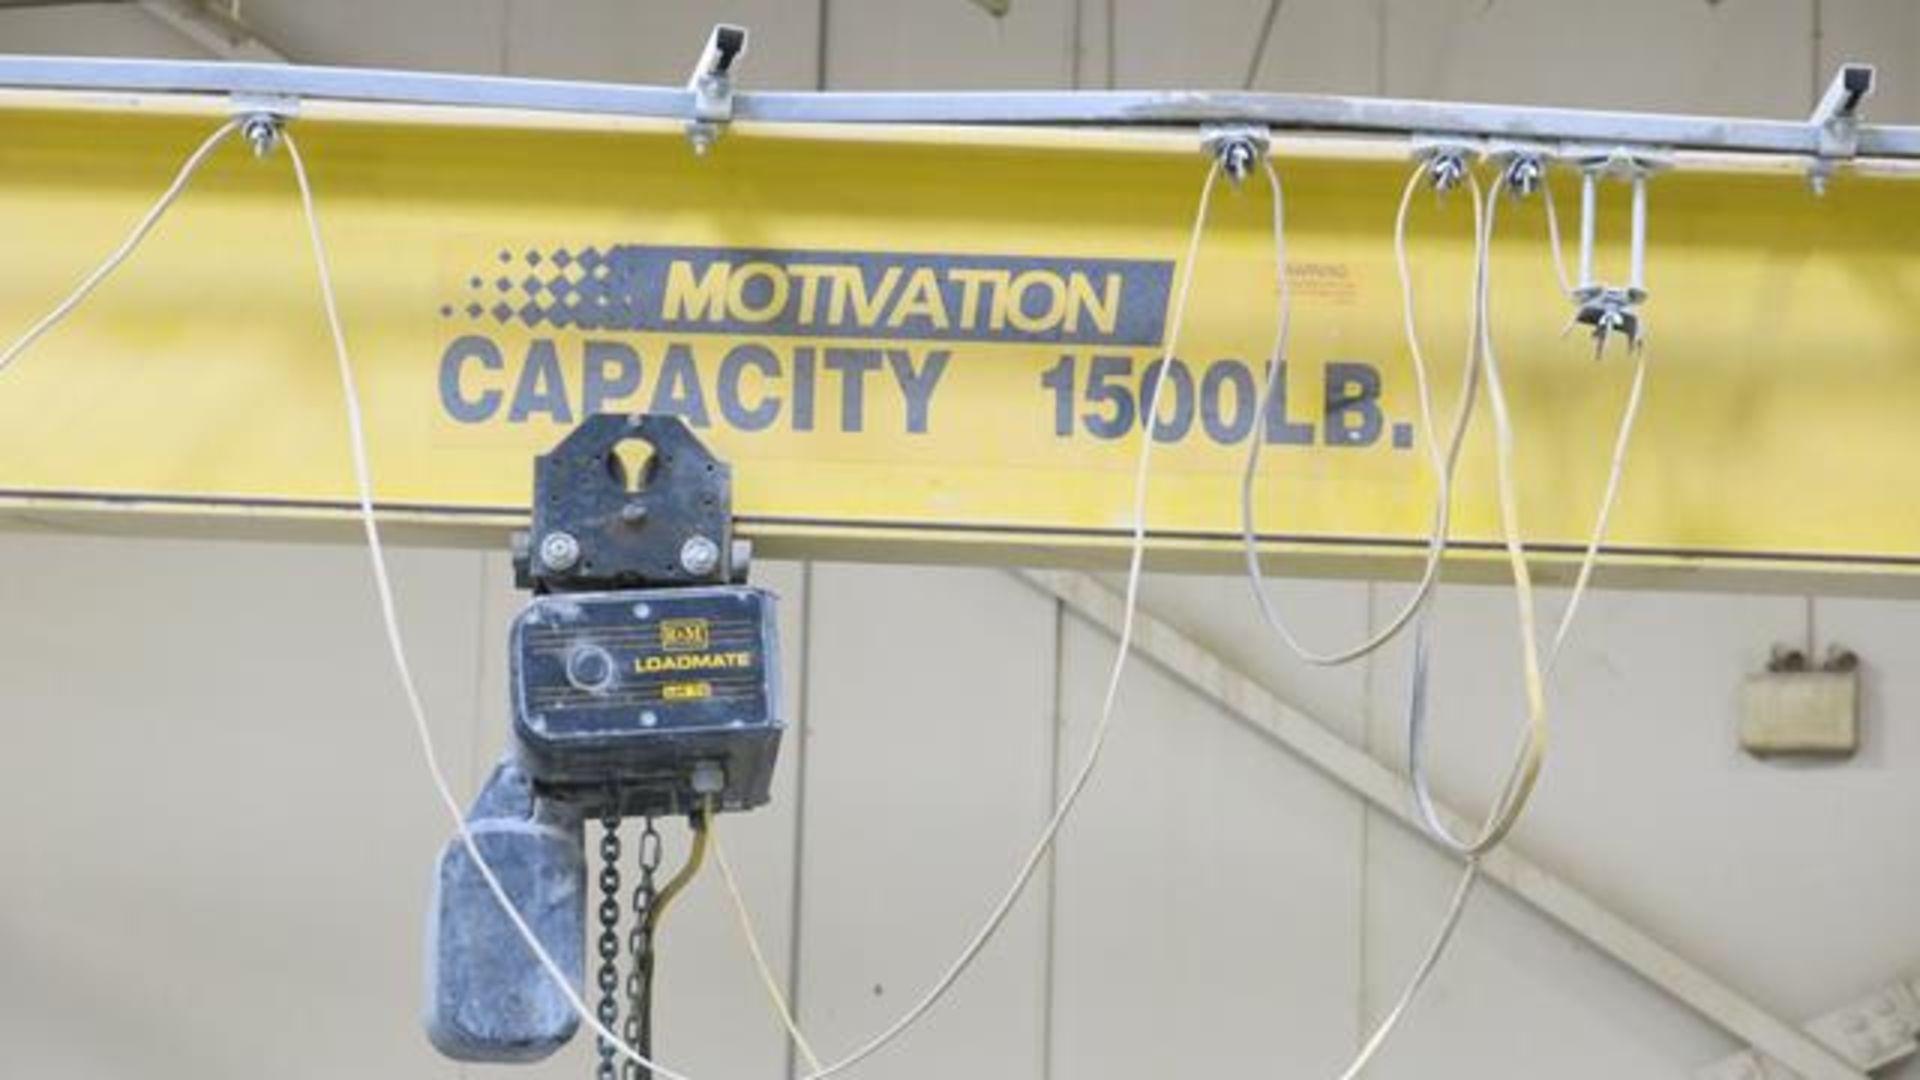 Lot 912 - MOTIVATION, 1,500 LBS., JIB CRANE WITH LOADMATE ELECTRIC HOIST